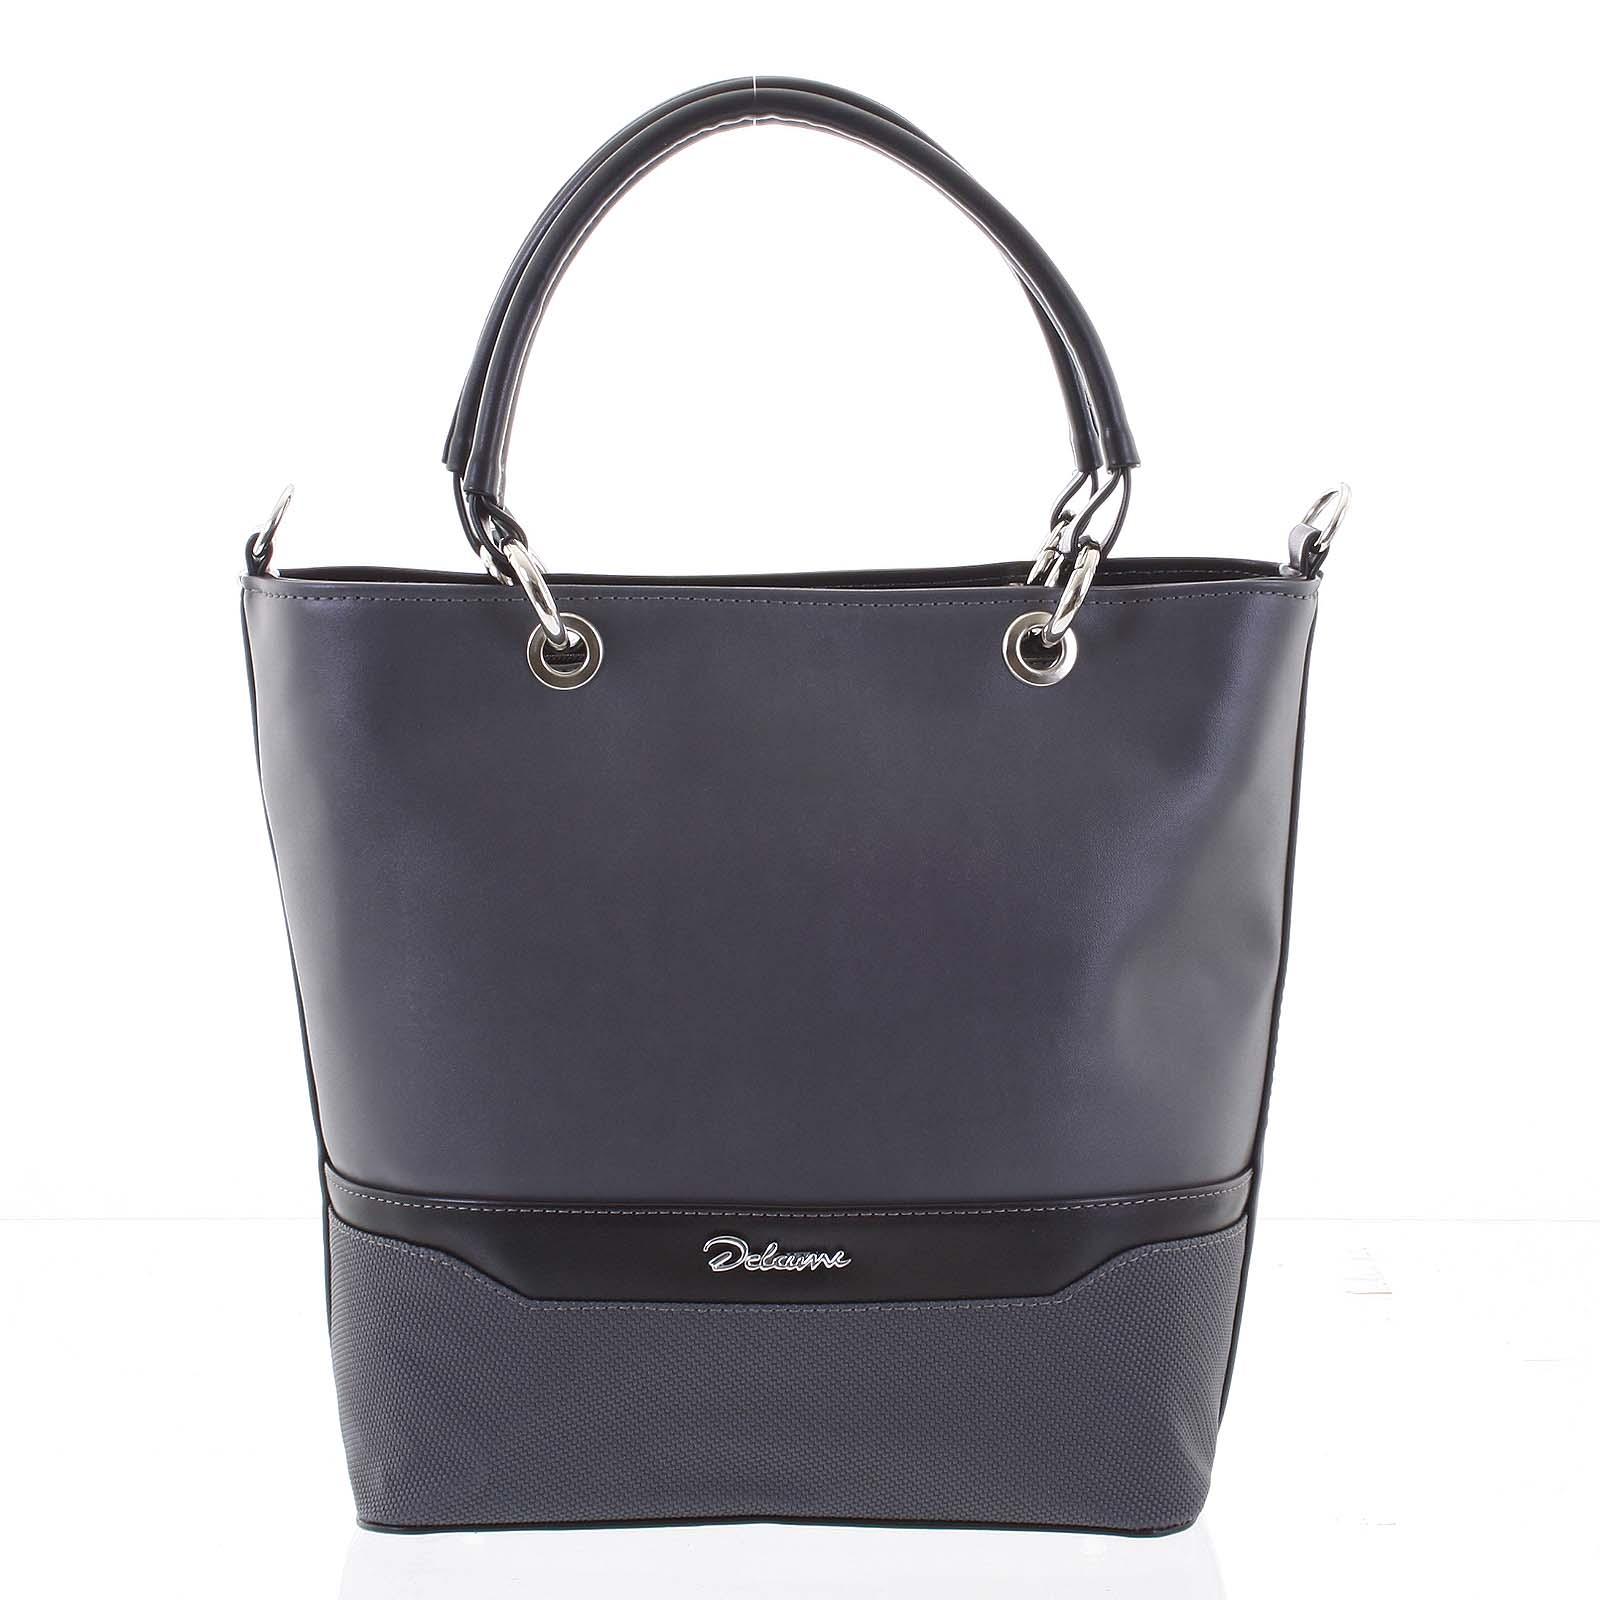 Jedinečná dámská kabelka šedá - Delami Leanna šedá